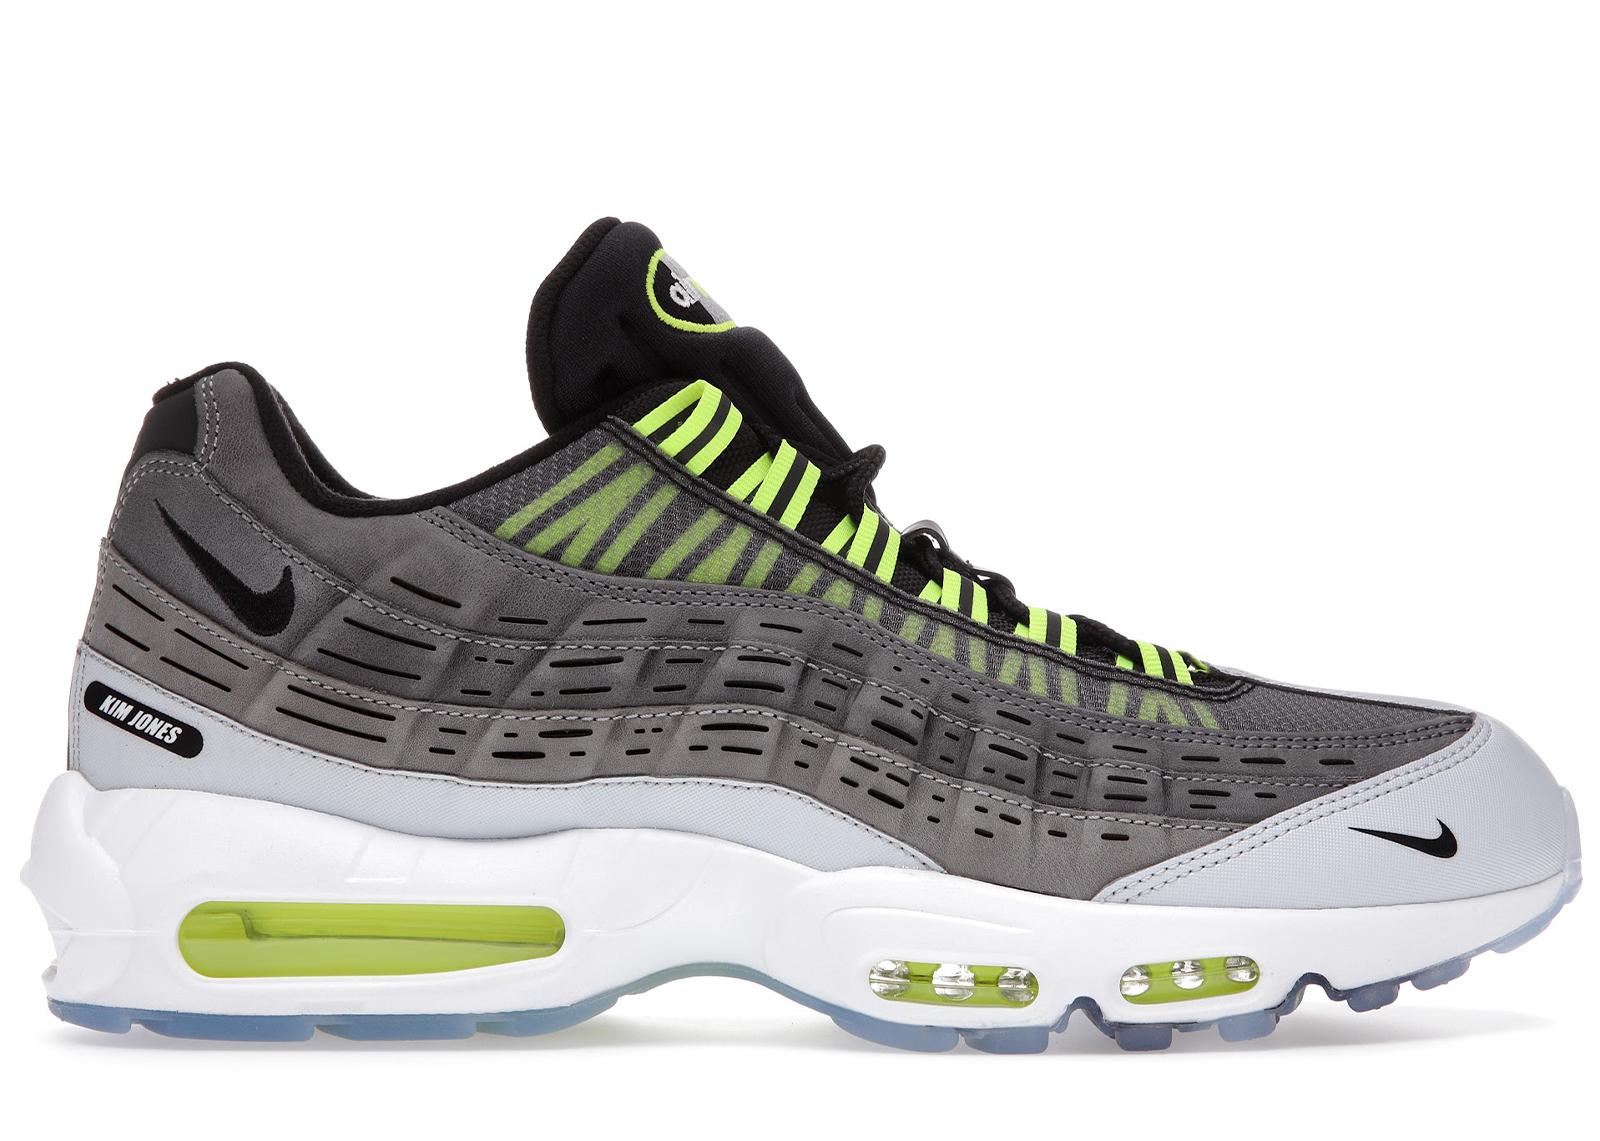 Nike Air Max 95 Kim Jones Total Volt